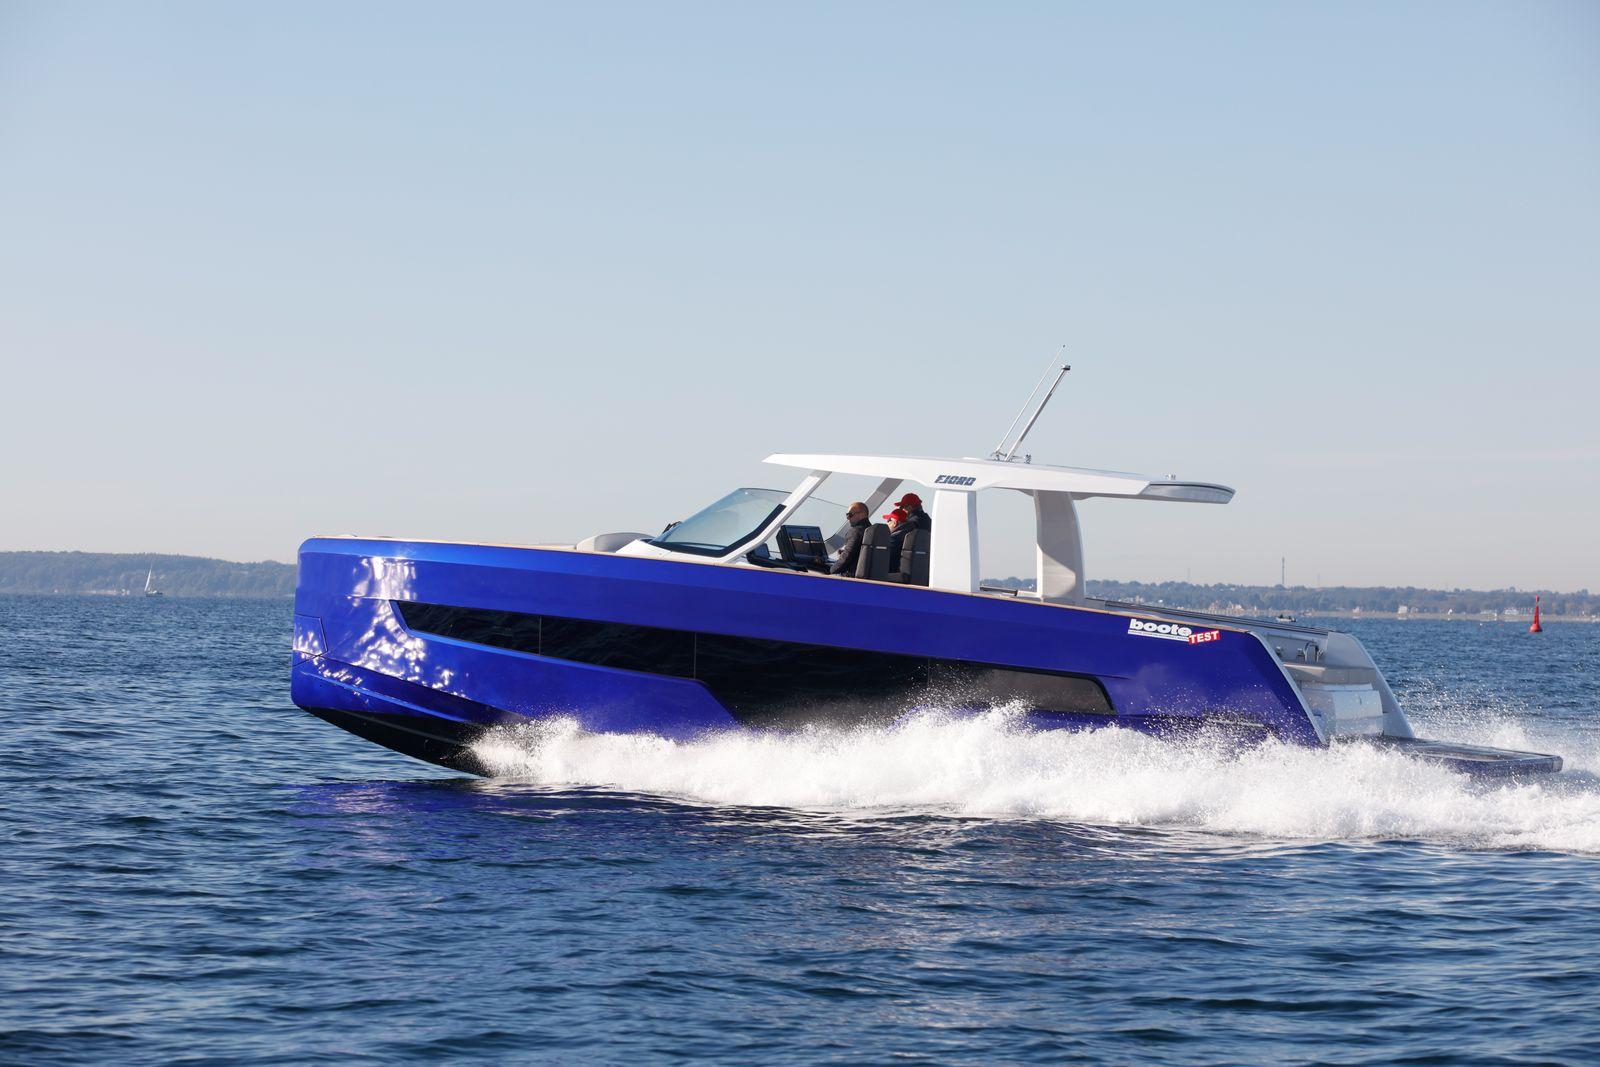 Boote Test Boot: Fjord 41 XL Motor: 2x Volvo Penta D6-440 Gewässer: Ostsee, Lübecker Bucht, Ancora Marina Redakteur: Ralf Marquard, Hanseyachts Greifswald via Henry Bleck